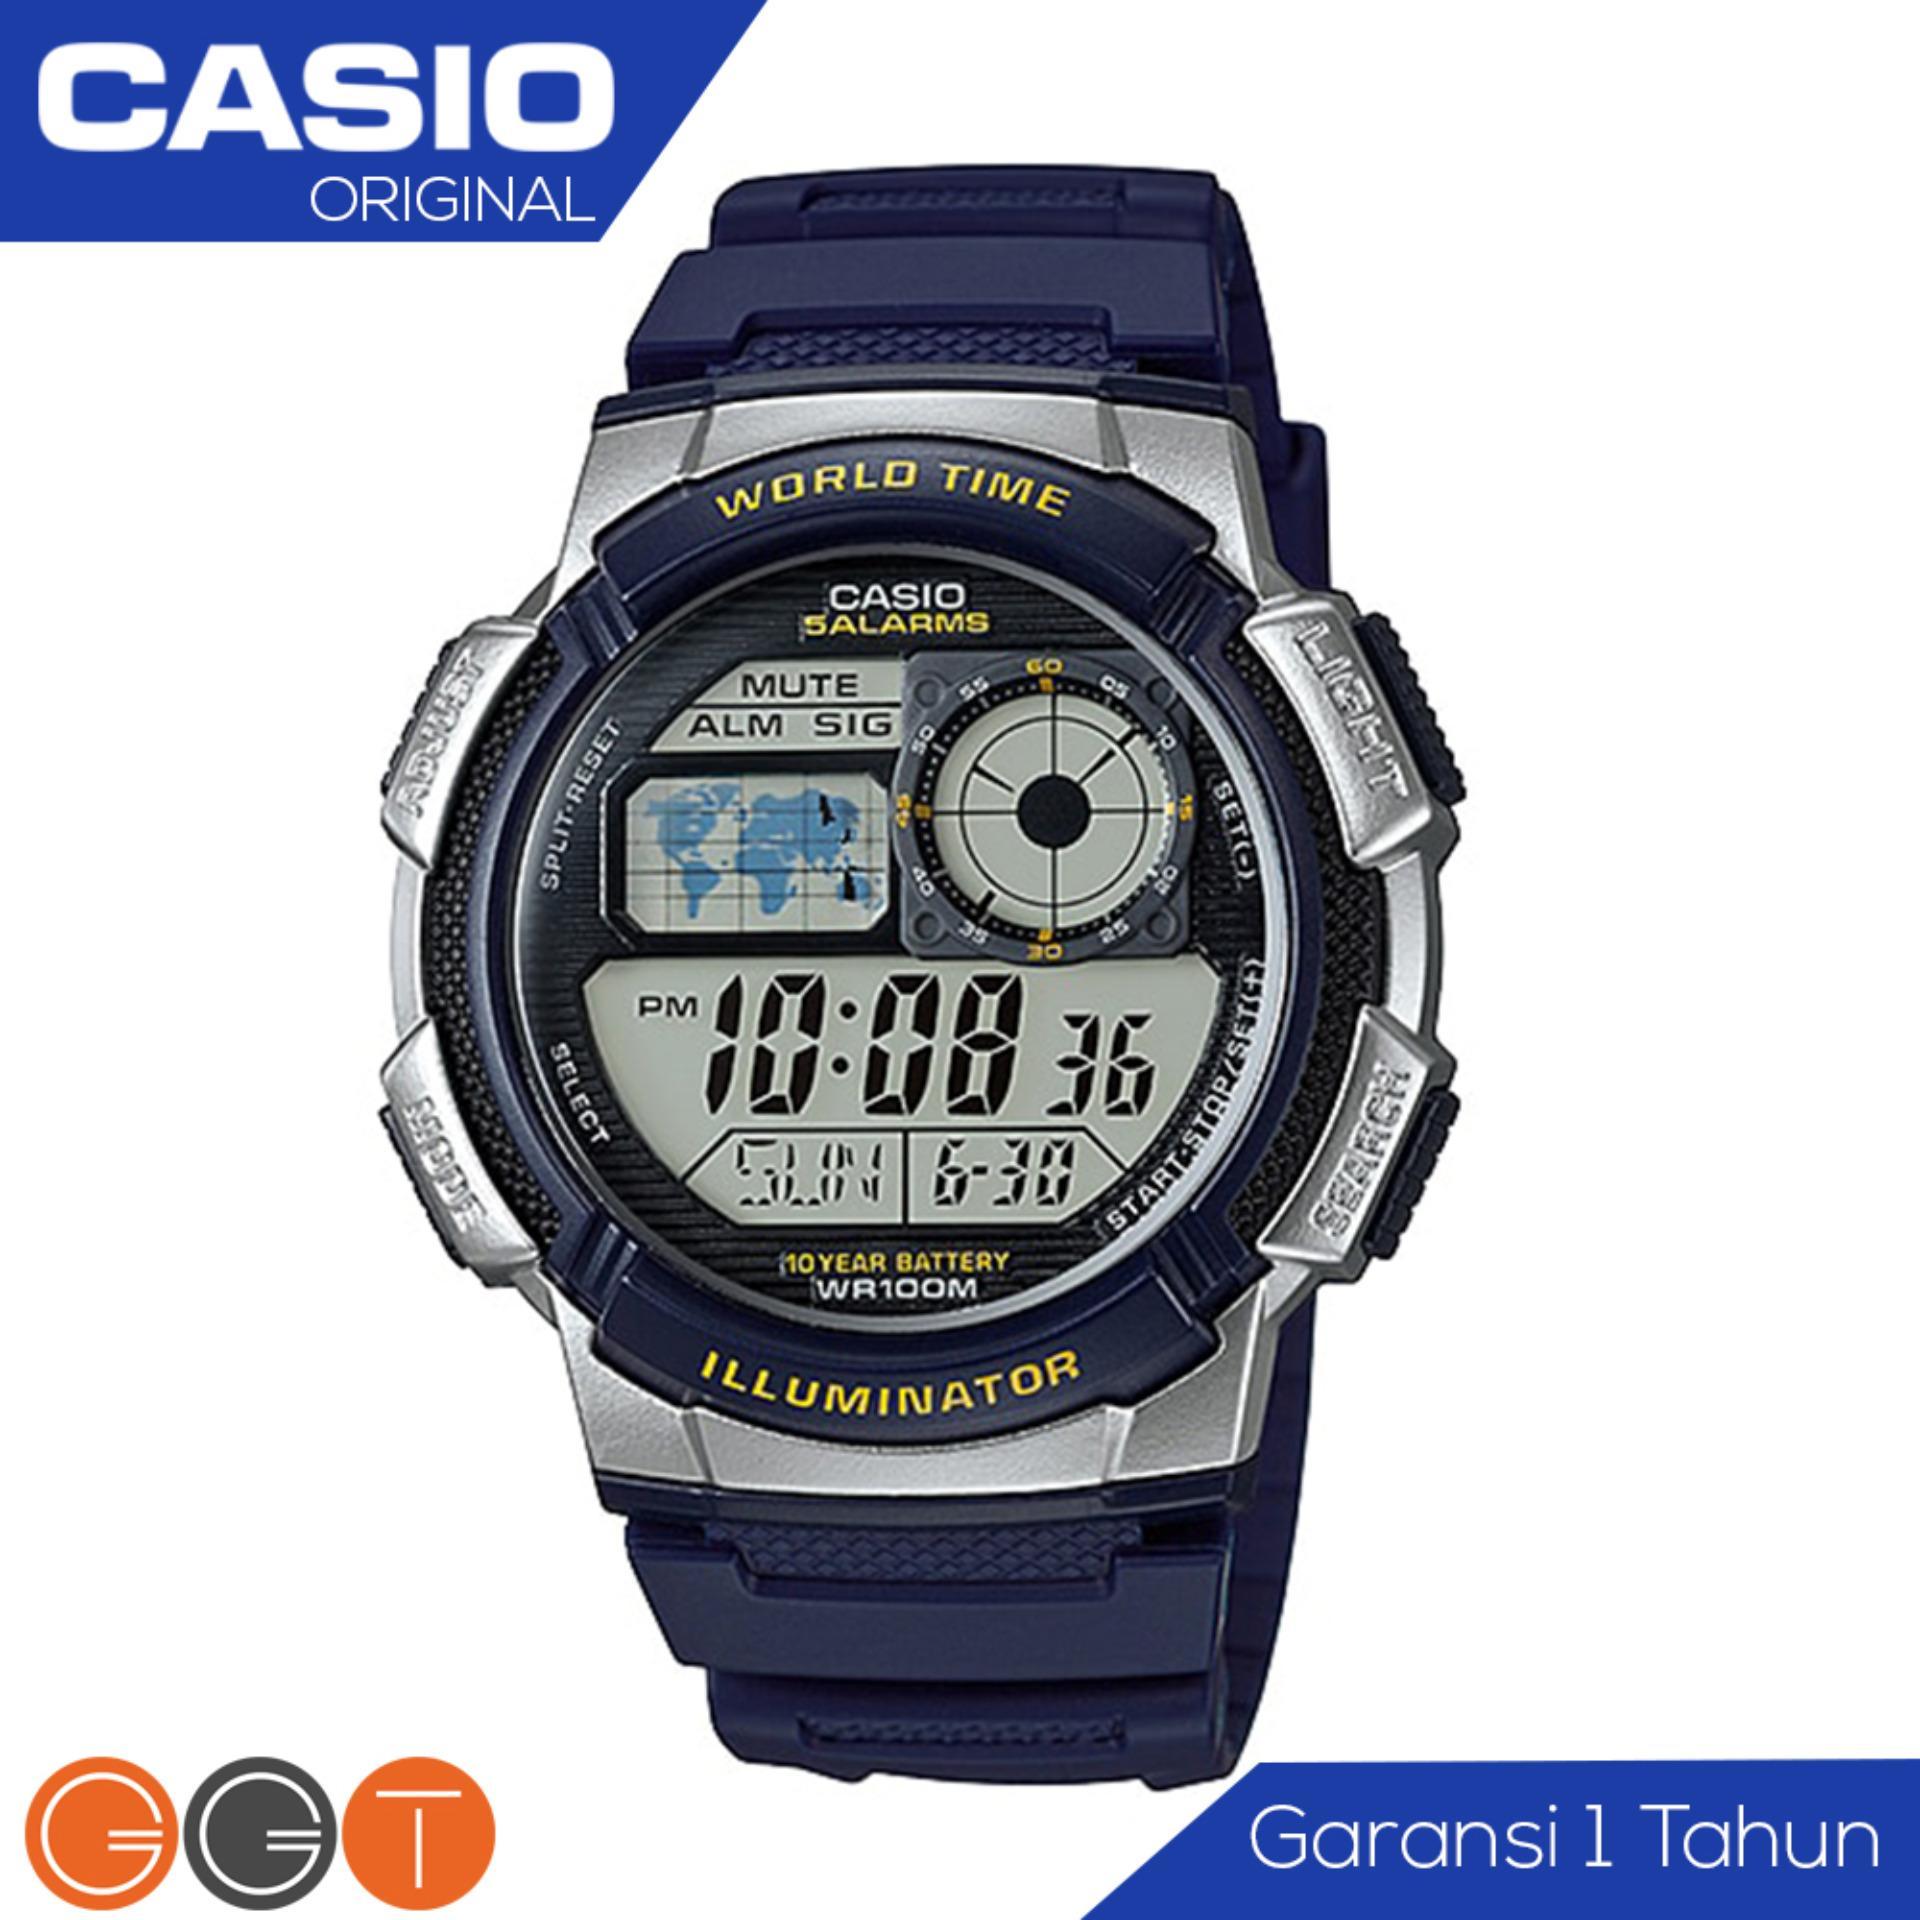 CASIO Original Illuminator AE-1000W - Jam Tangan Pria Casio - Tali Karet  Rubber Resin 1e010a61bf